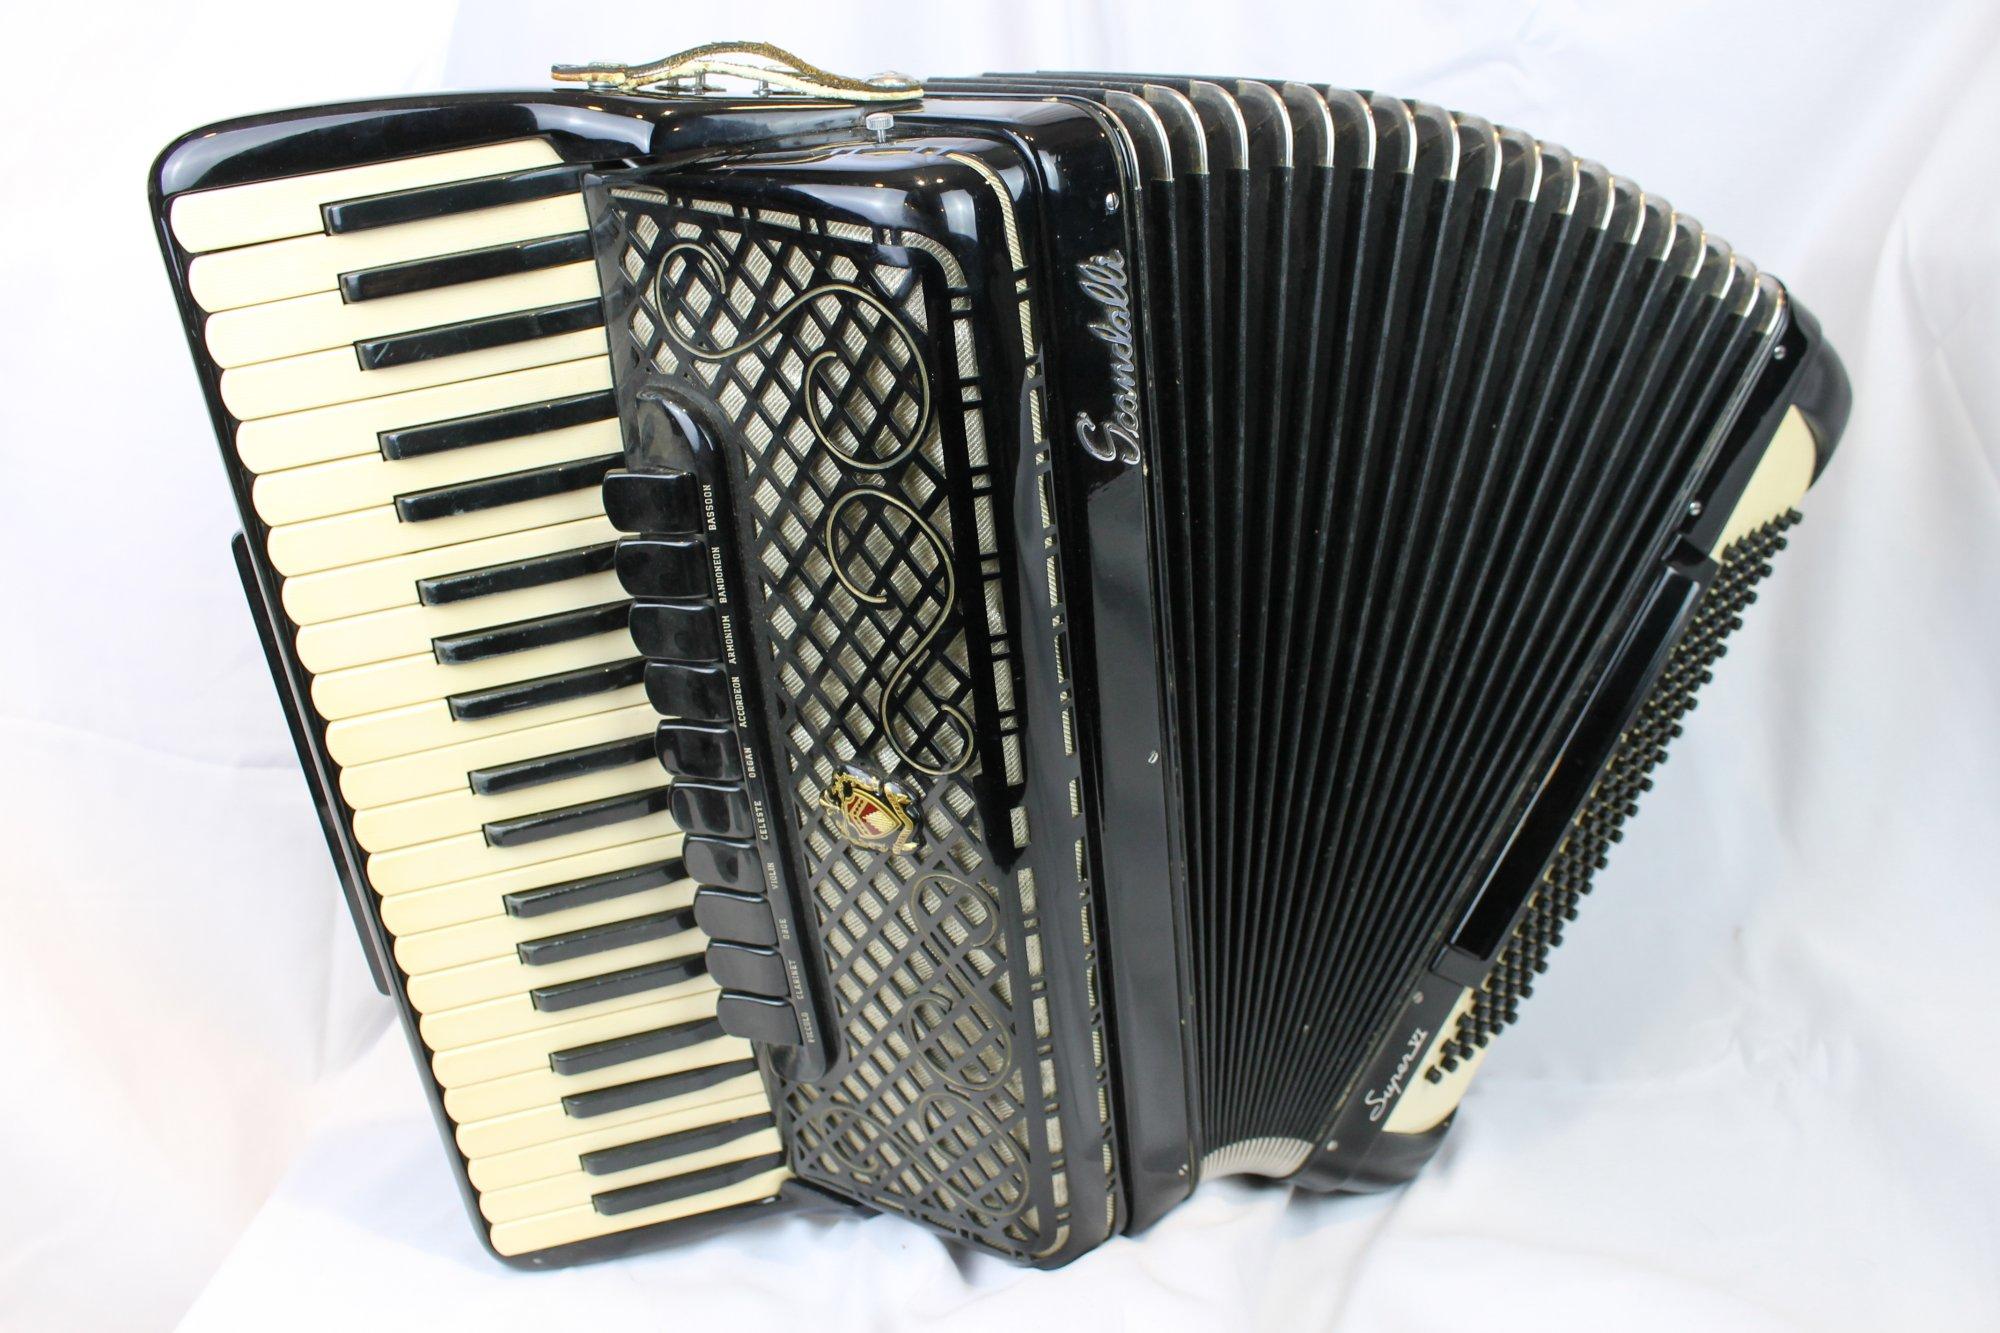 4032 - Black Scandalli Super VI 4S Vintage 1960s Piano Accordion LMMH 41 120